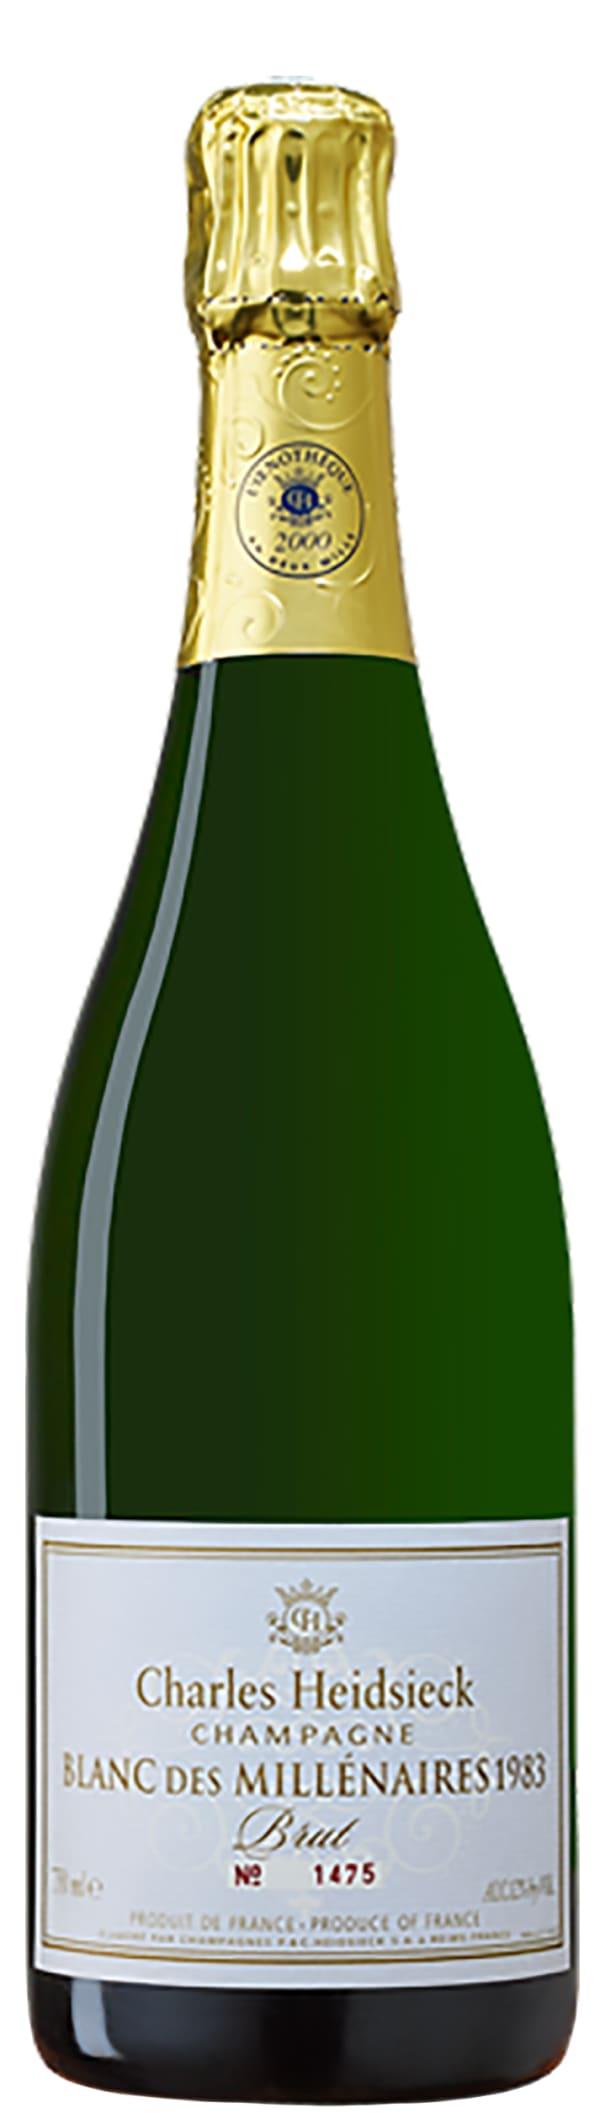 Charles Heidsieck Blanc des Millenaires Champagne Brut 1983